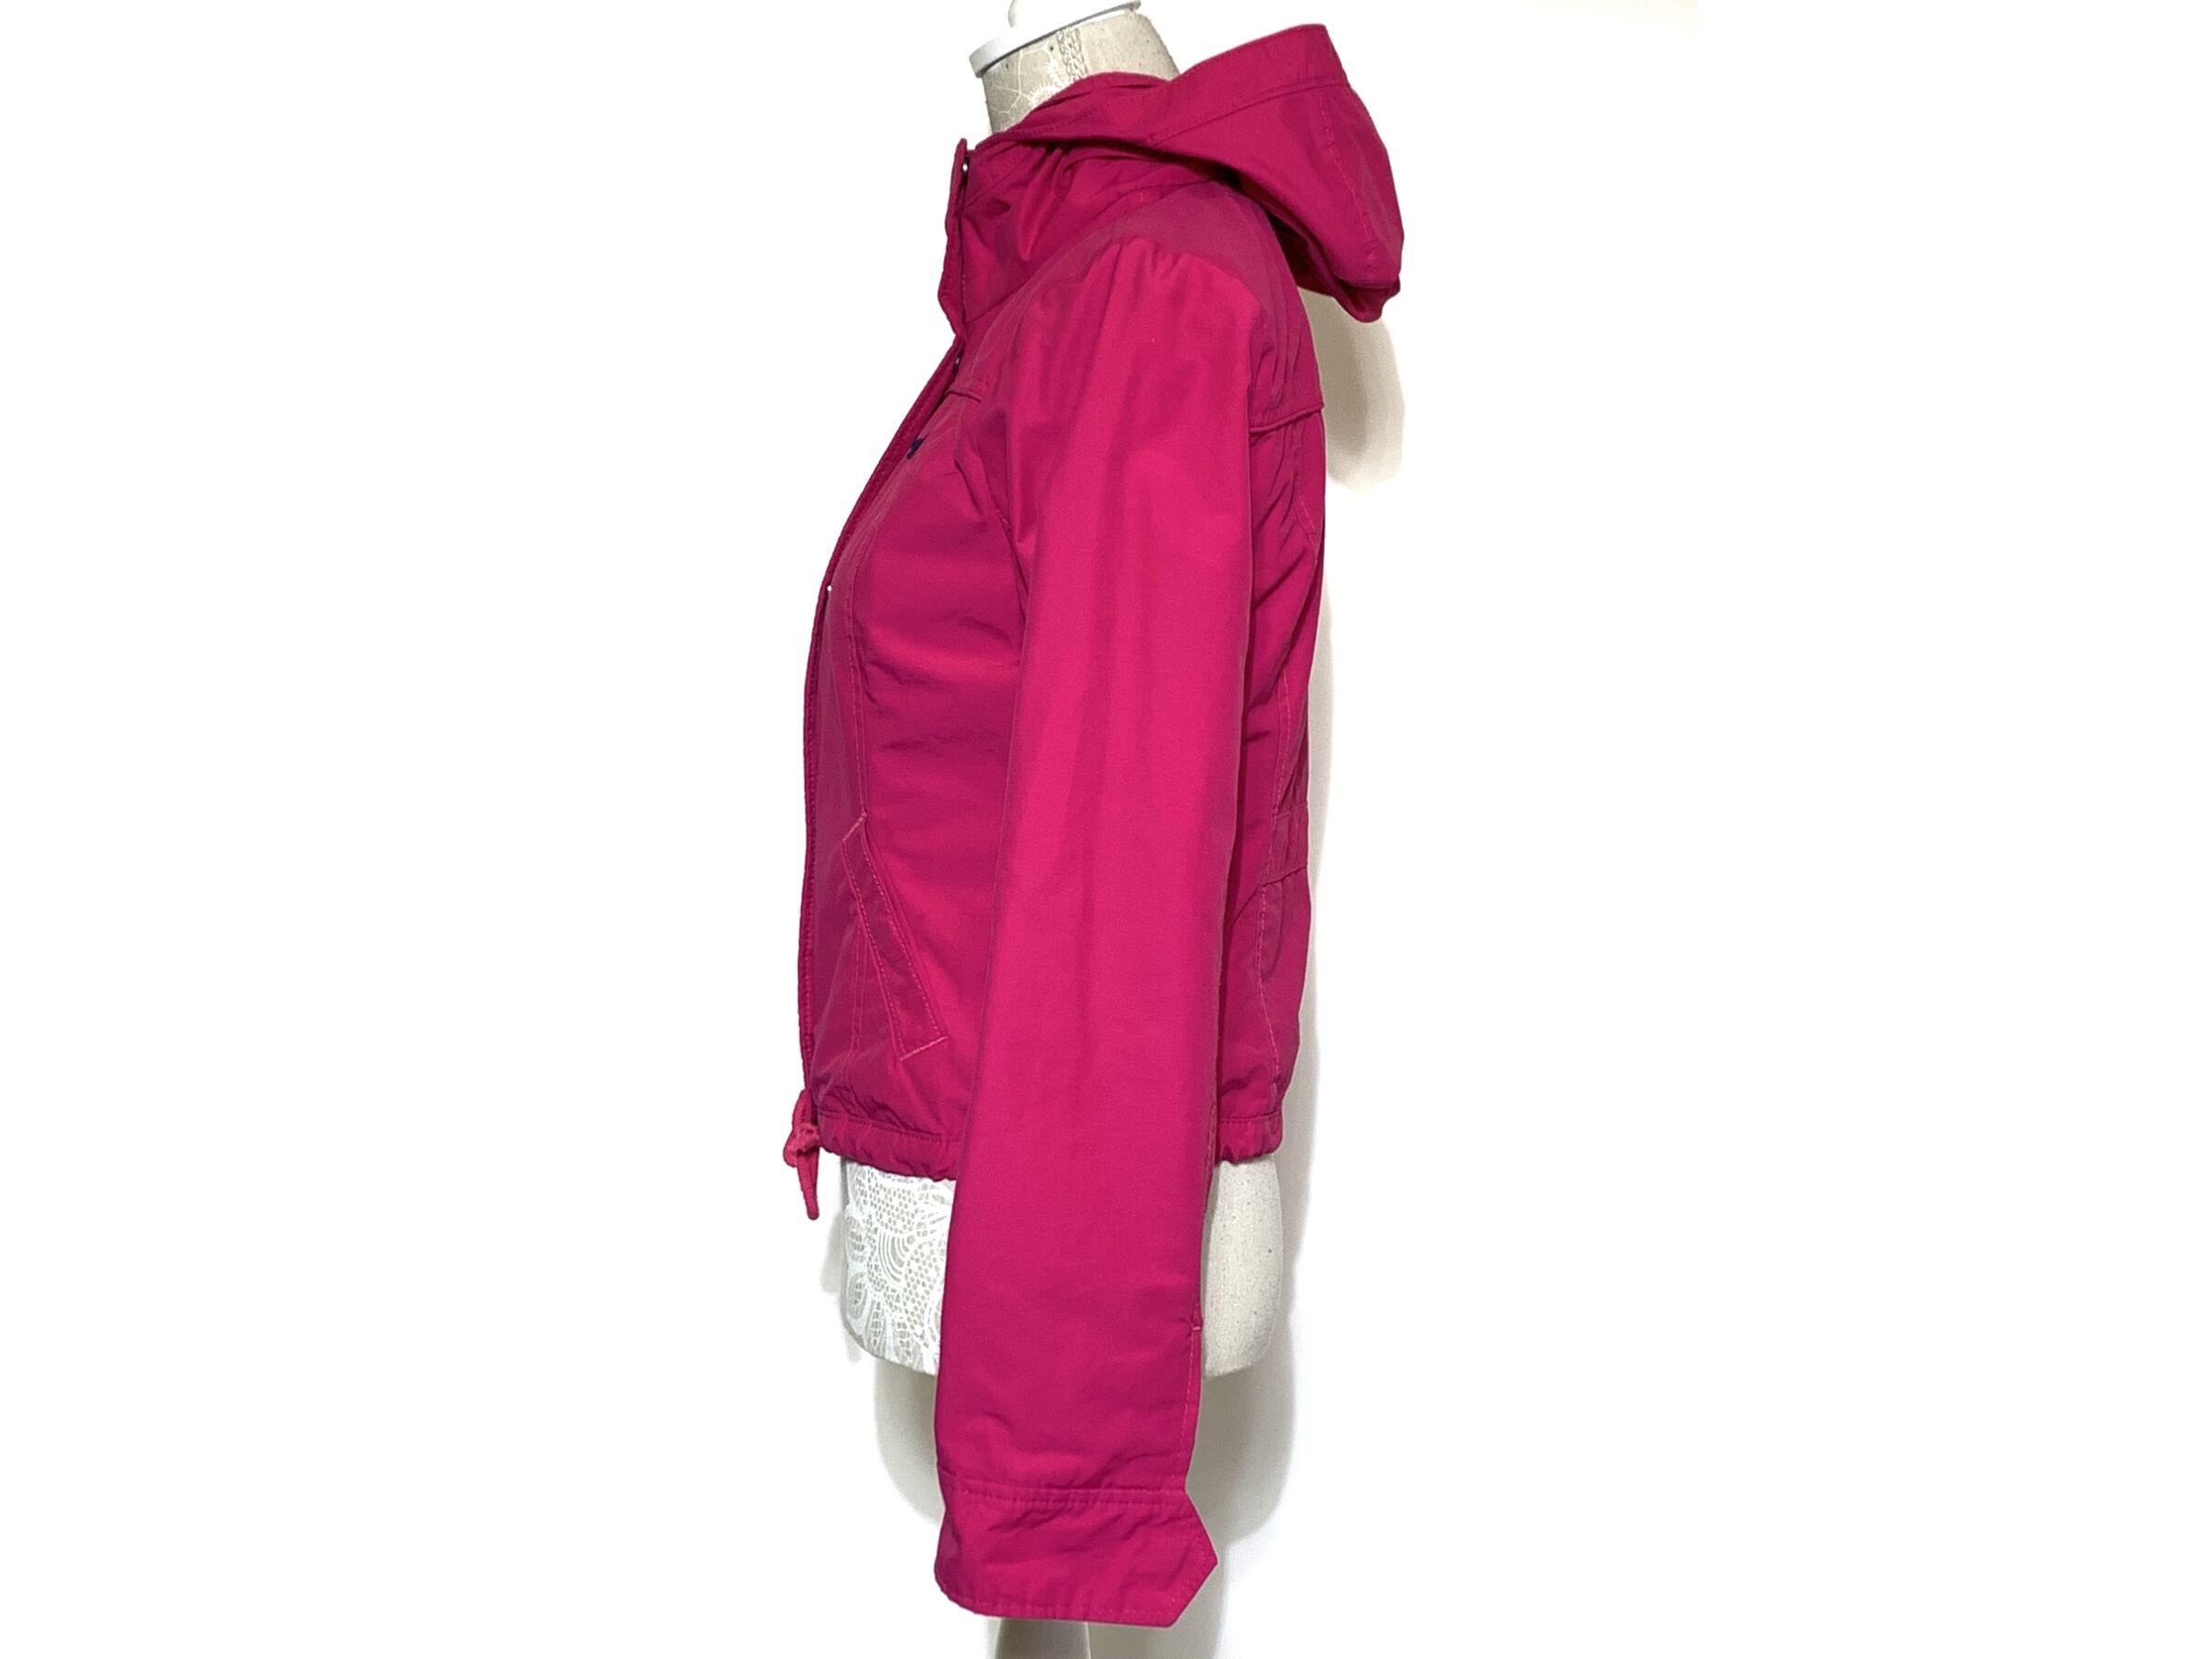 Hollister kabát (S)